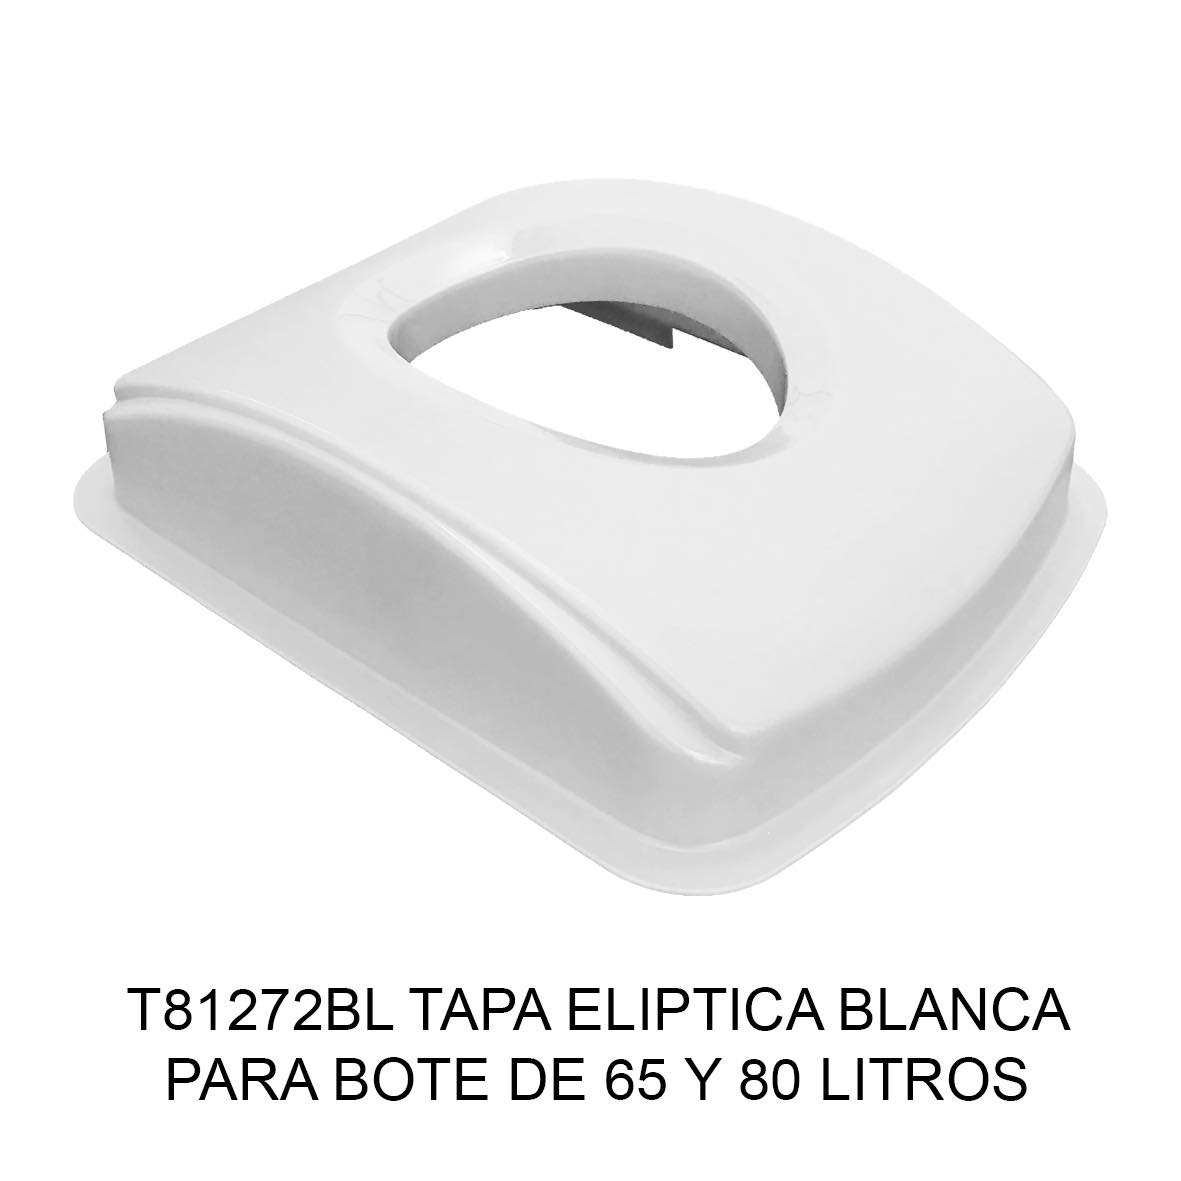 Tapa elíptica para bote de basura color blanco para botes de 65 y 80 litros Modelo T81272BL de Sablón